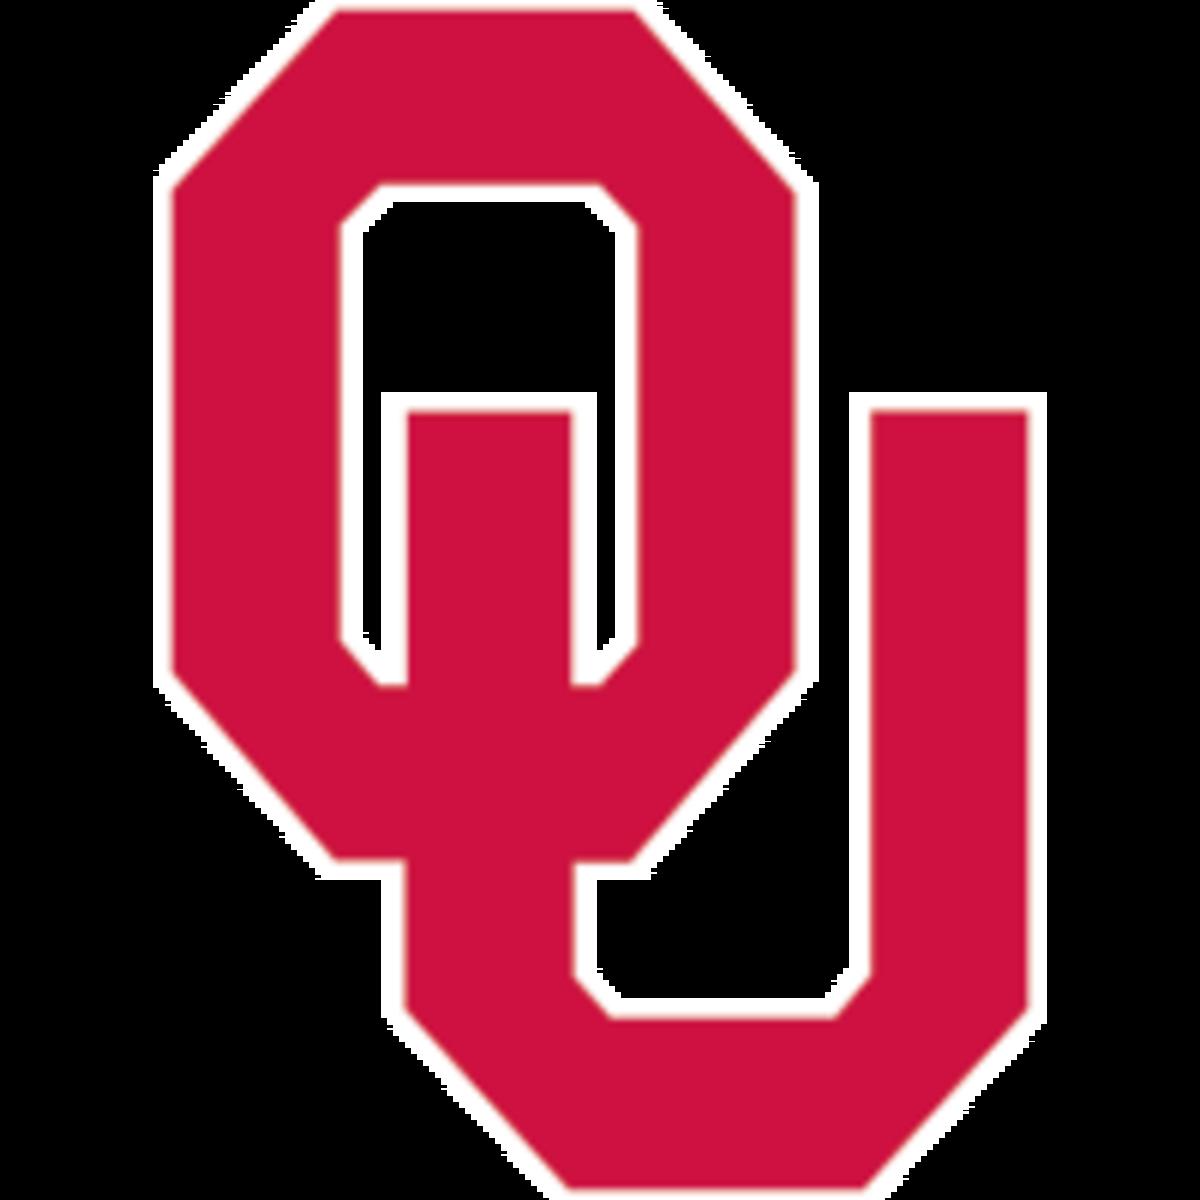 College Football Top 25 Rankings: Oklahoma